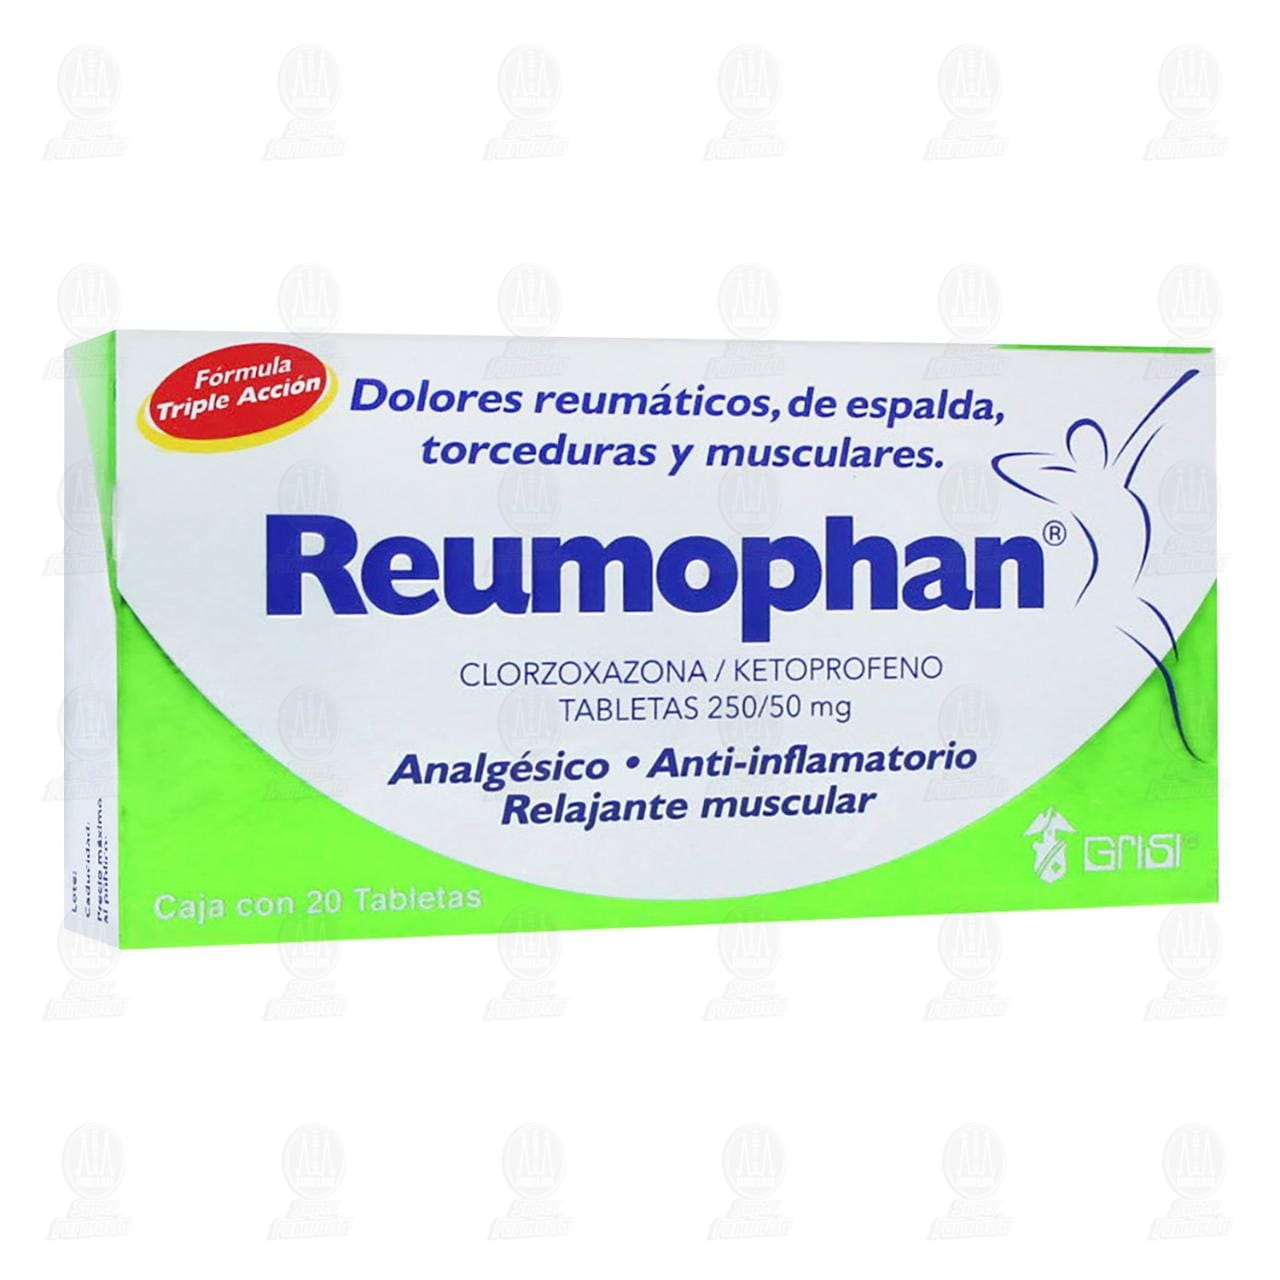 Reumophan 250mg 20 Tabletas